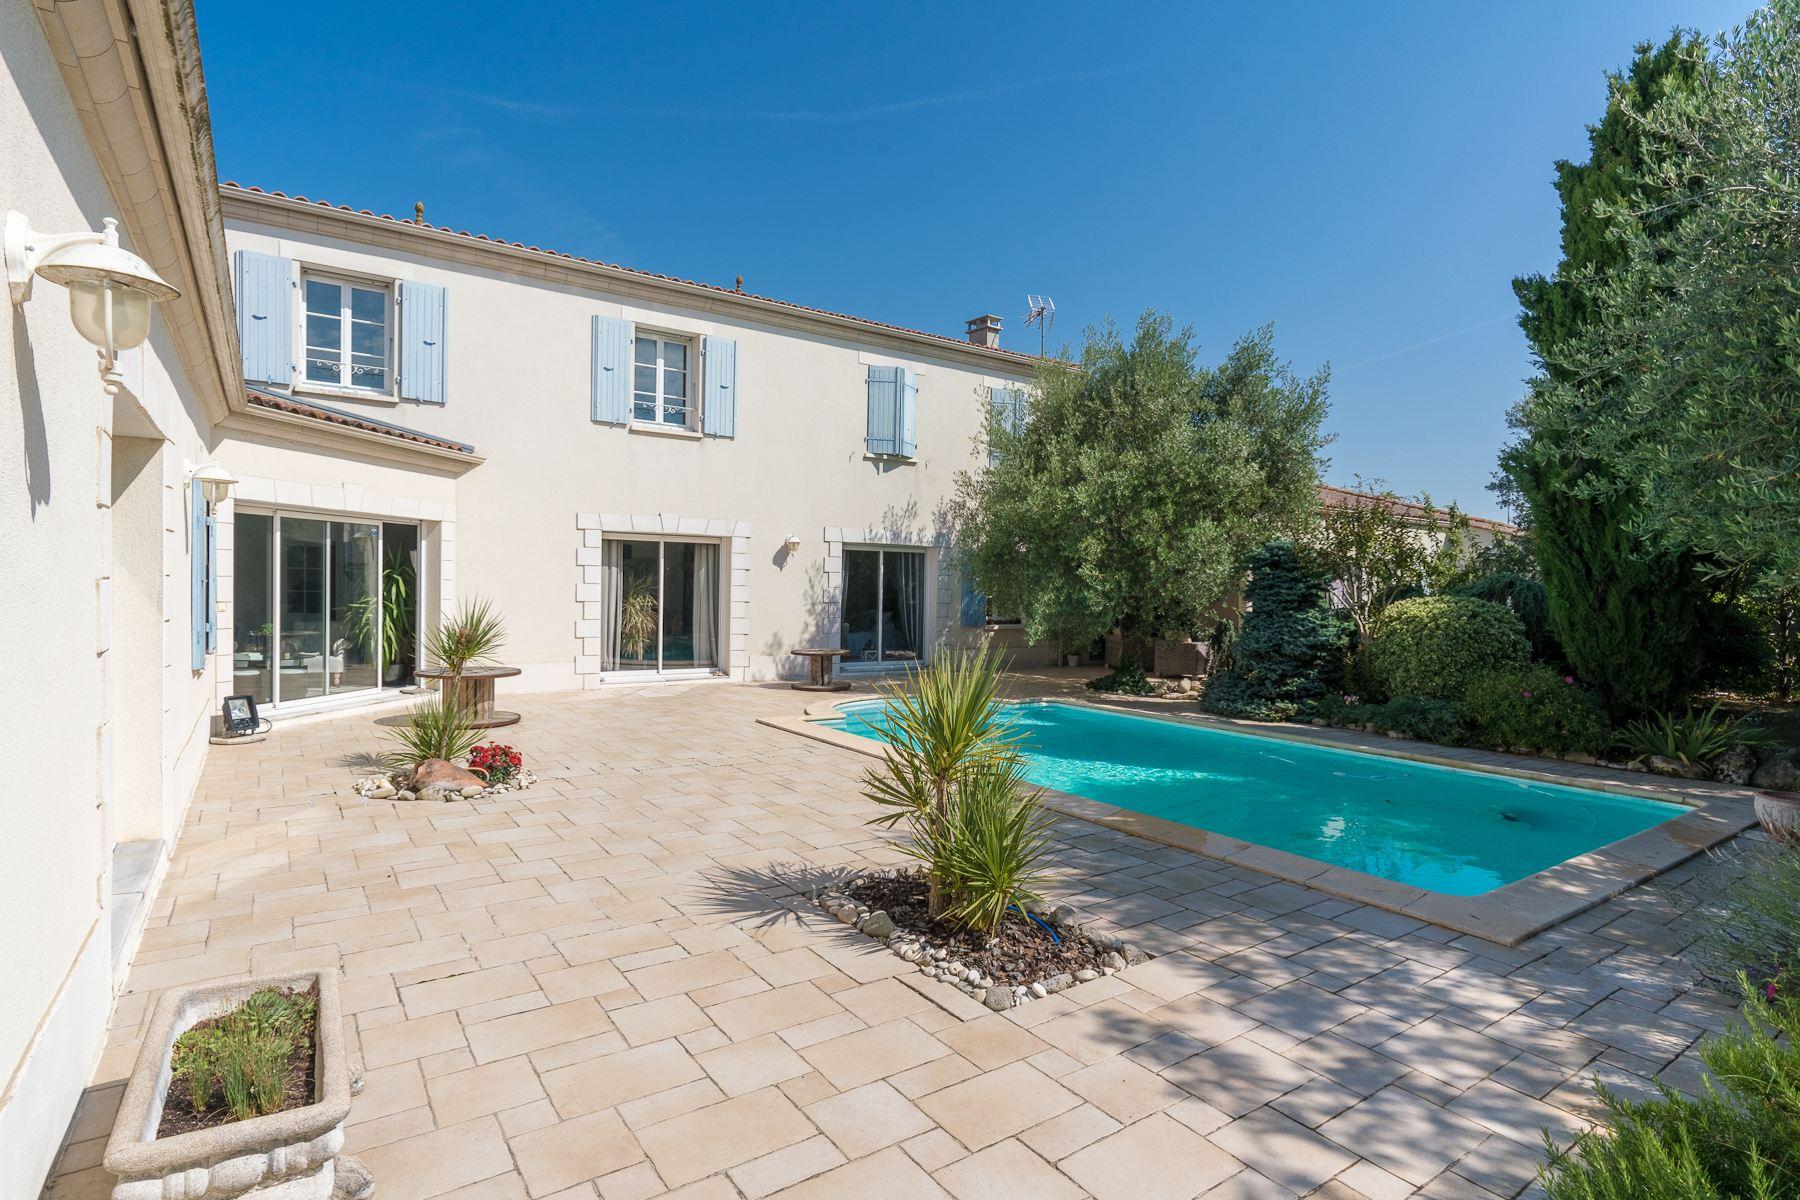 Single Family Homes 为 销售 在 Family House Châtelaillon Plage 拉罗谢尔, 普瓦图夏朗德 17000 法国